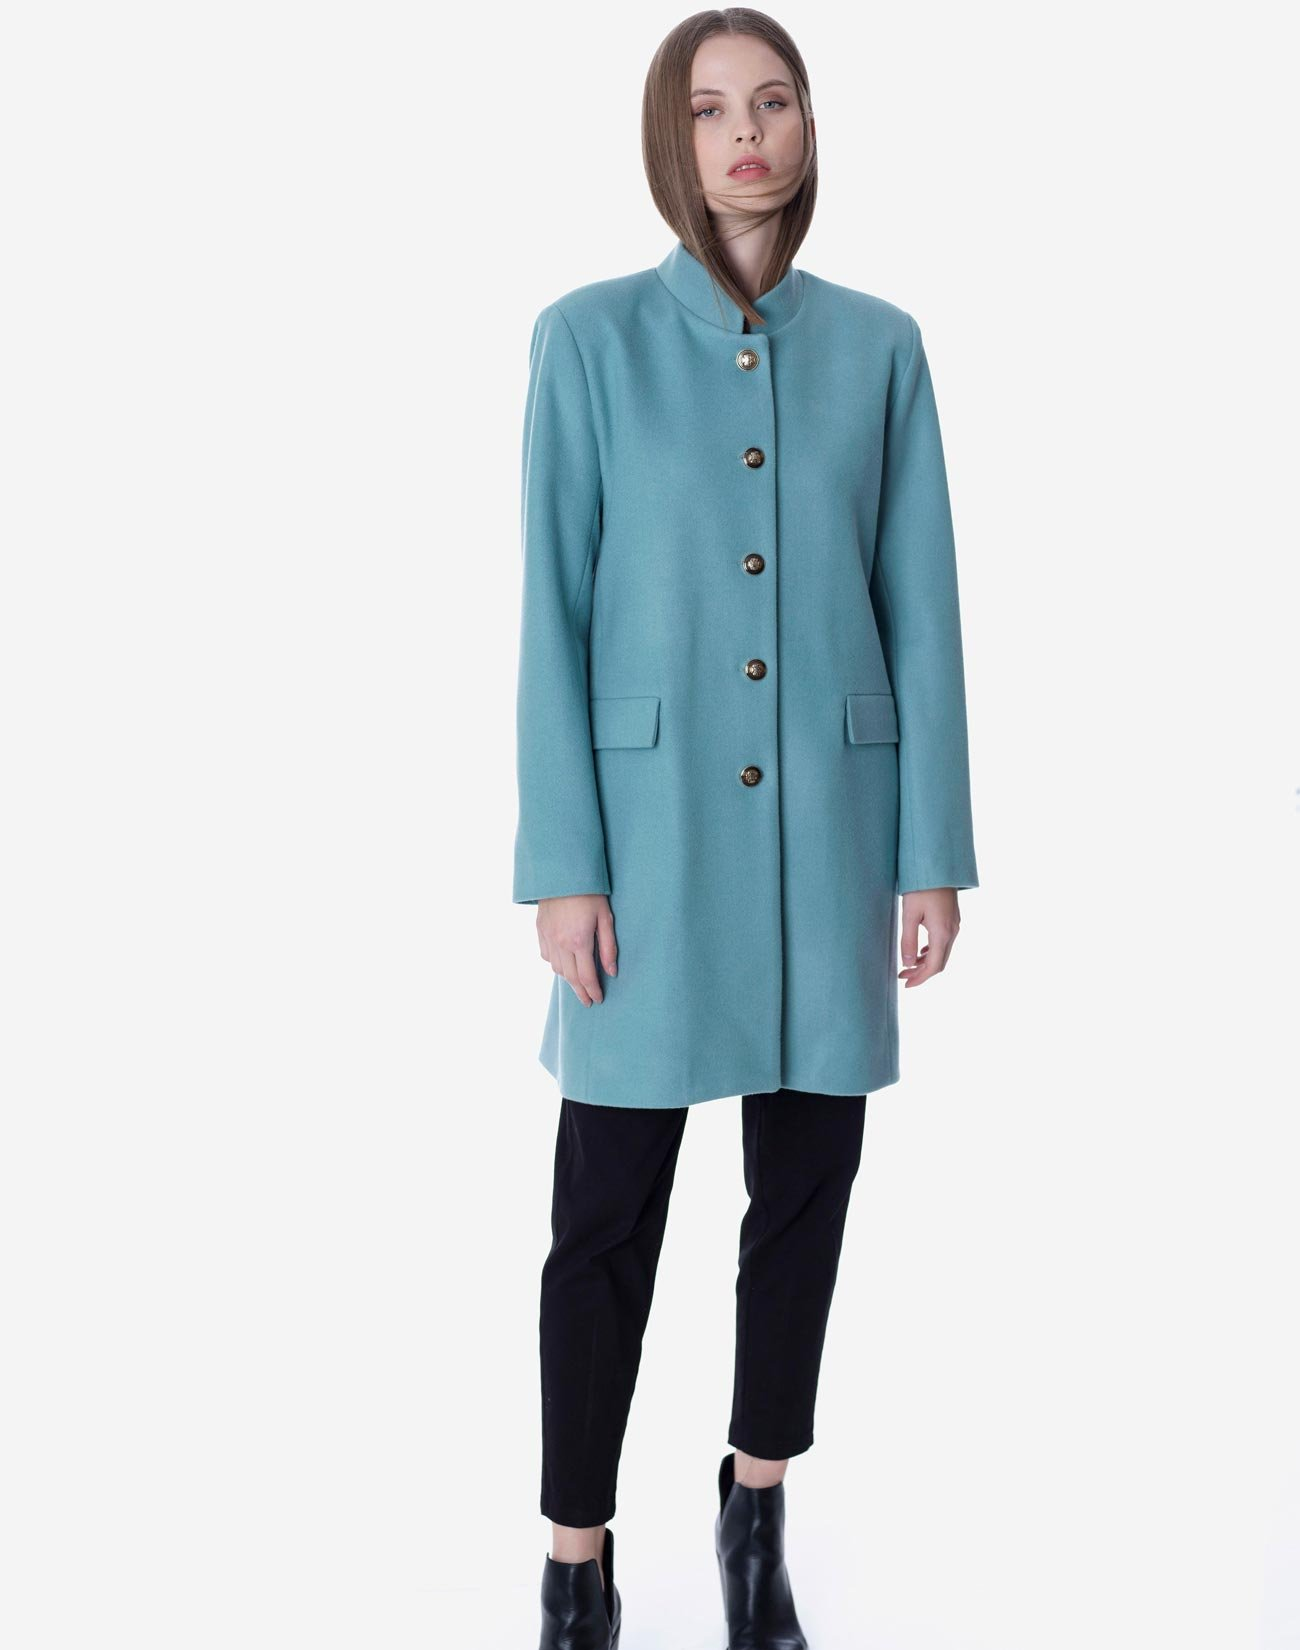 Coat with mandarin collar